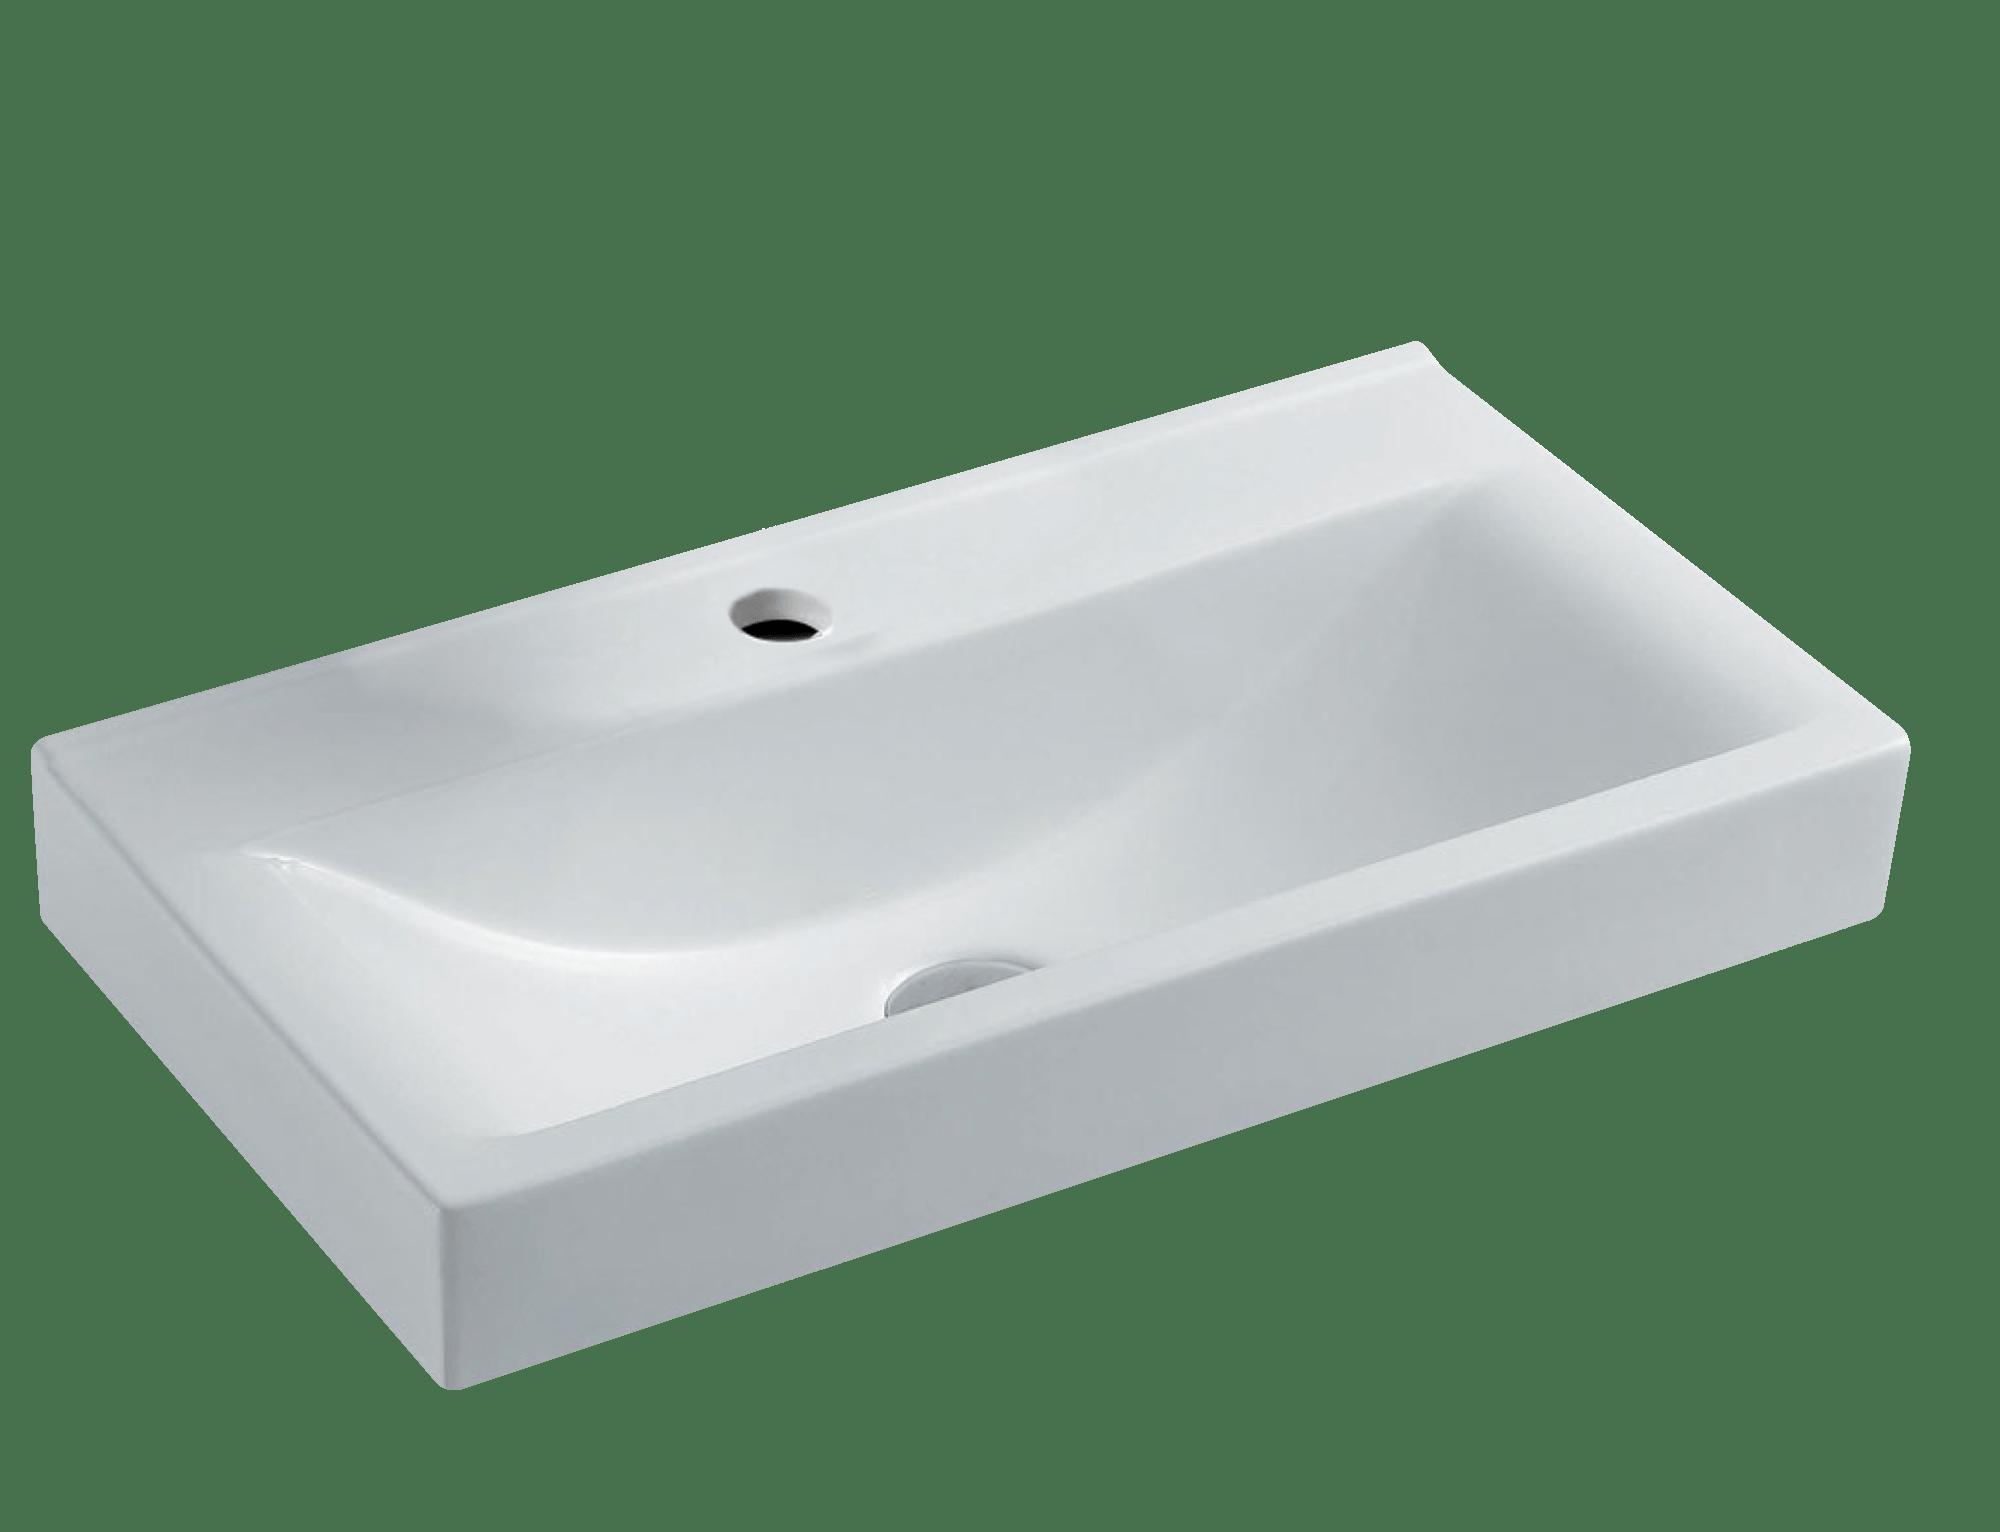 Drop in sink transparent png stickpng - Carreau transparent salle de bain ...